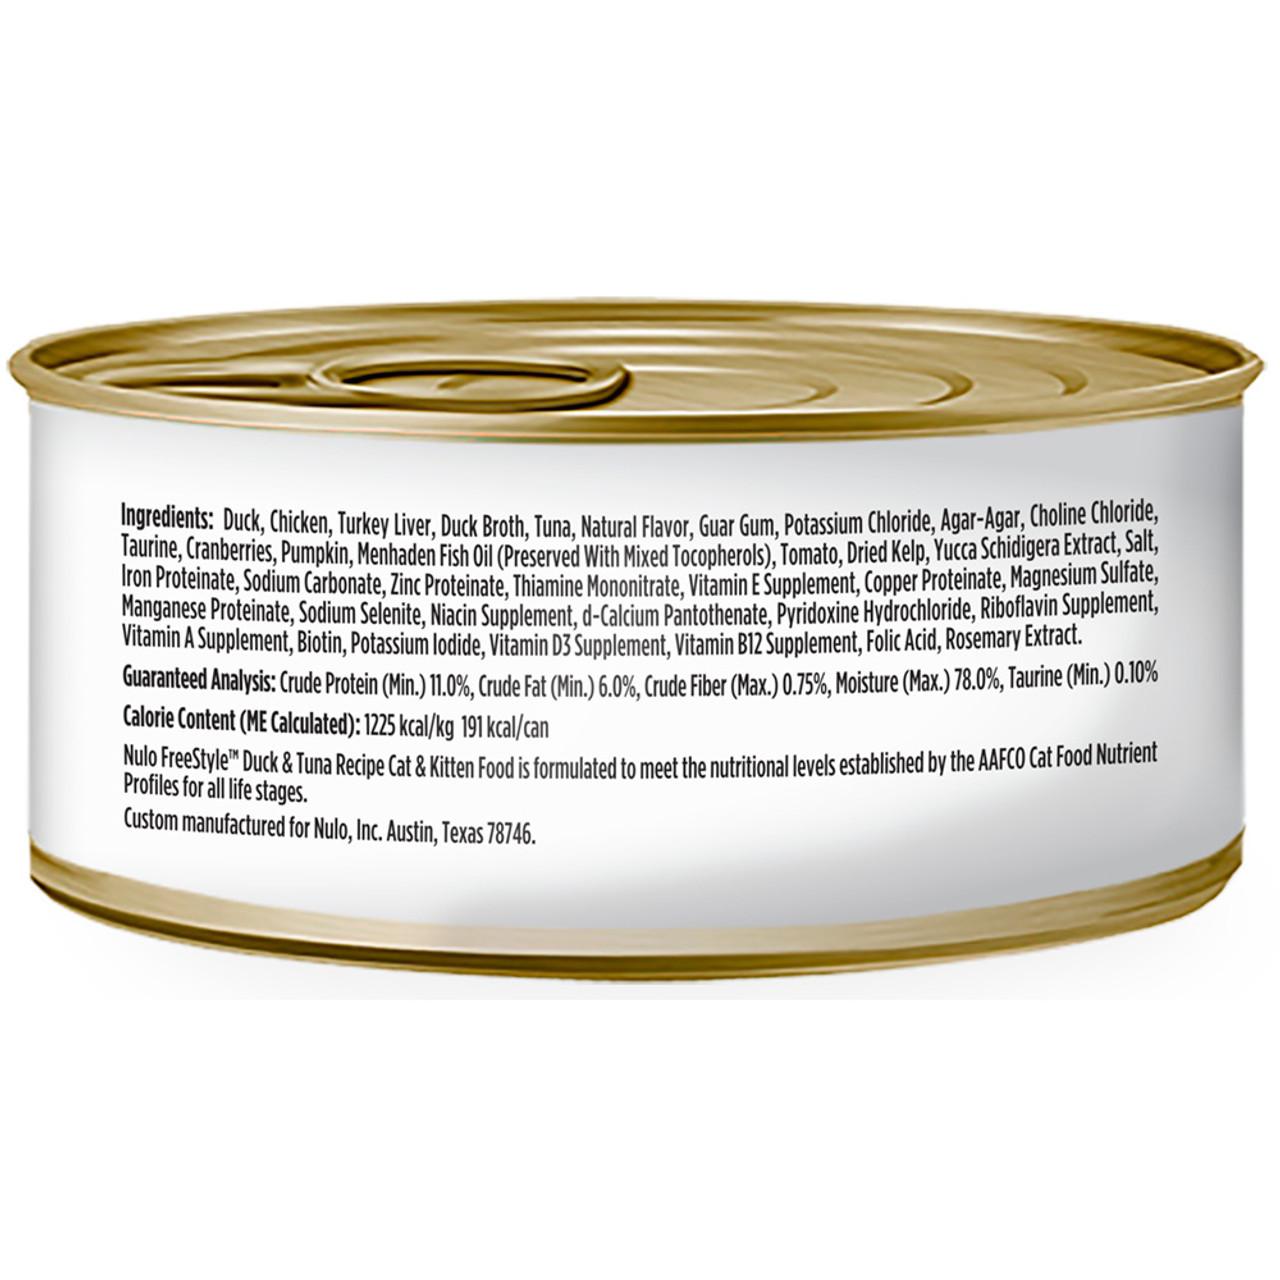 Nulo Freestyle Cat & Kitten Duck & Tuna Recipe Canned Cat Food